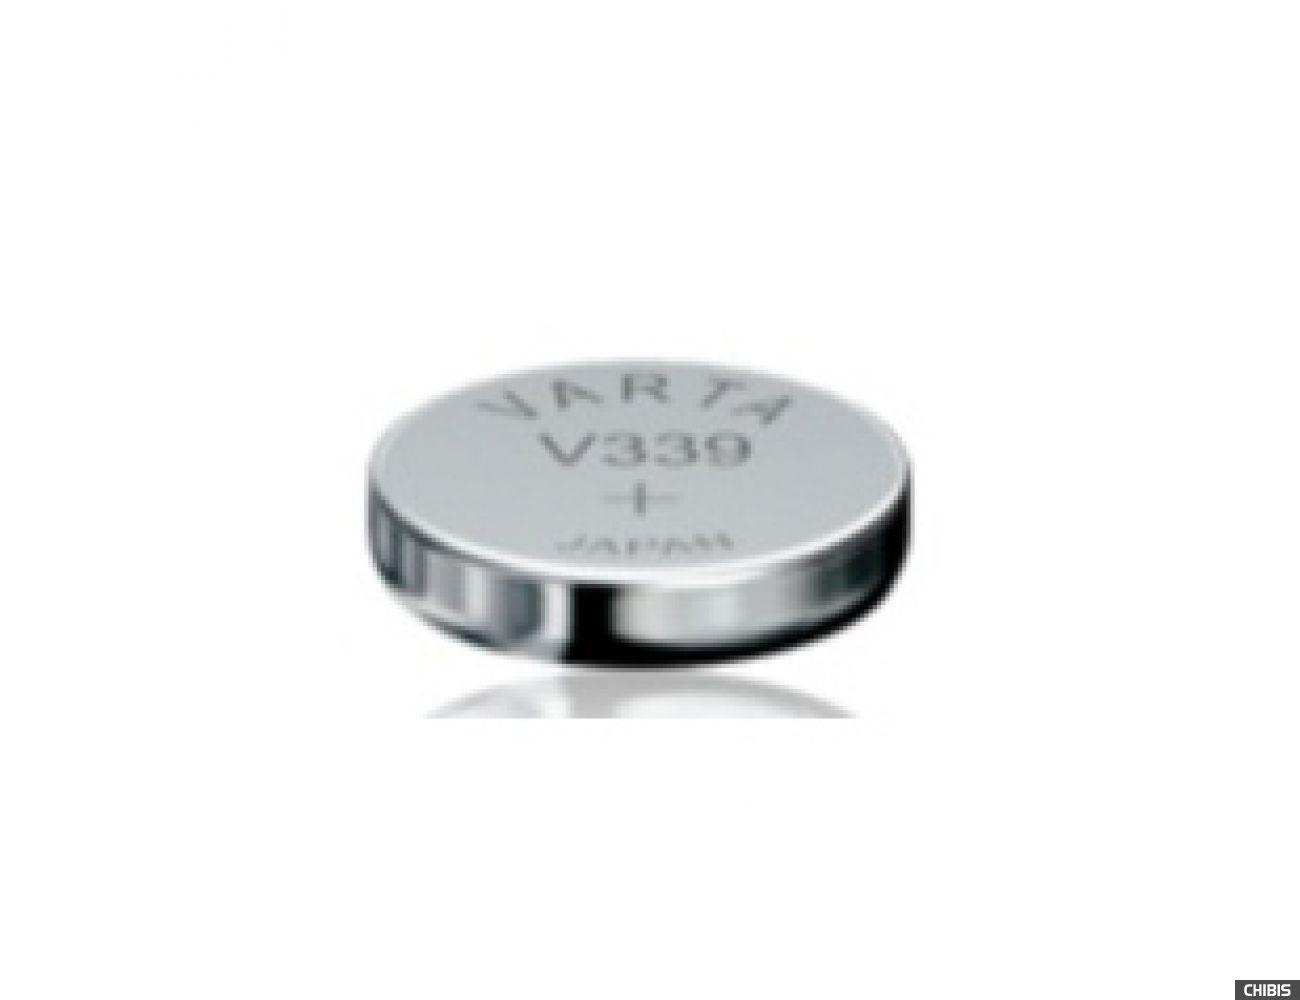 Батарейка Varta V339 (11mAh, 1.55V, Оксид Серебра) 00339101111